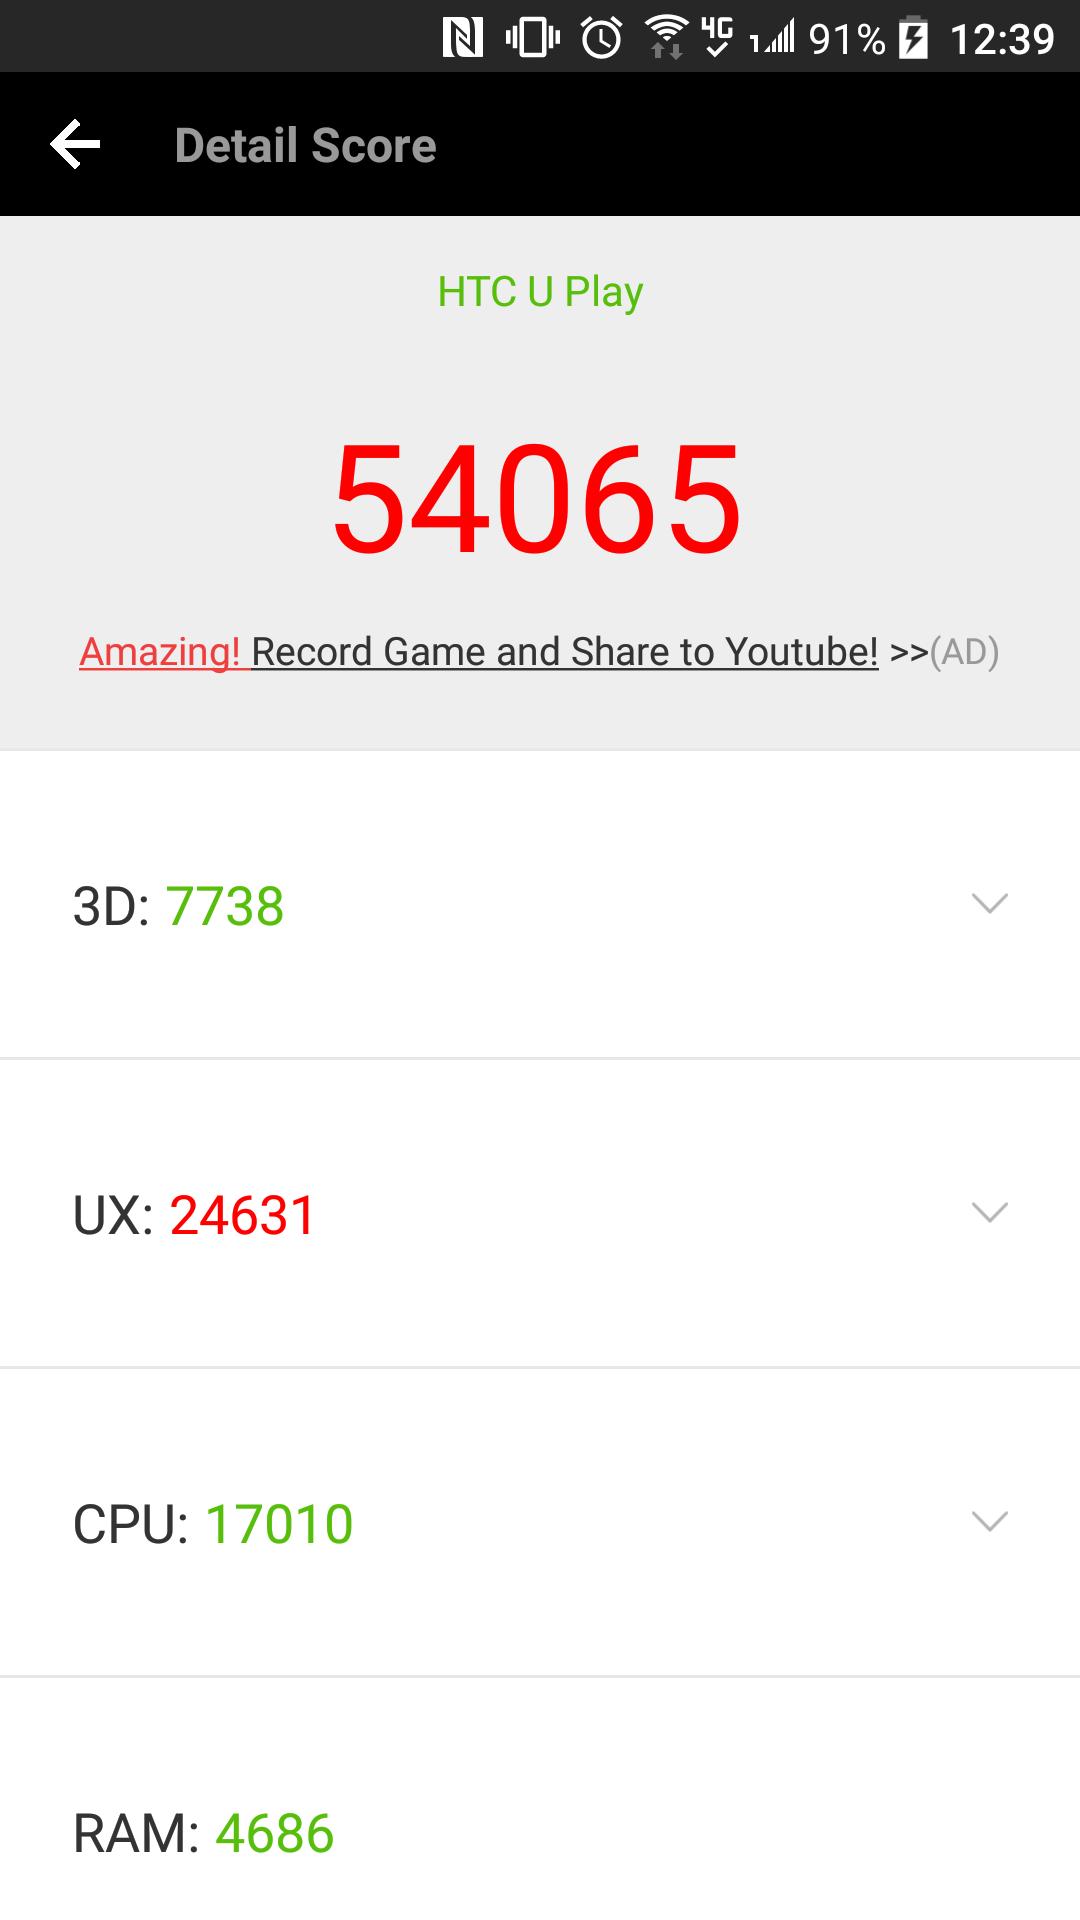 HTC U Play screenshot (6)